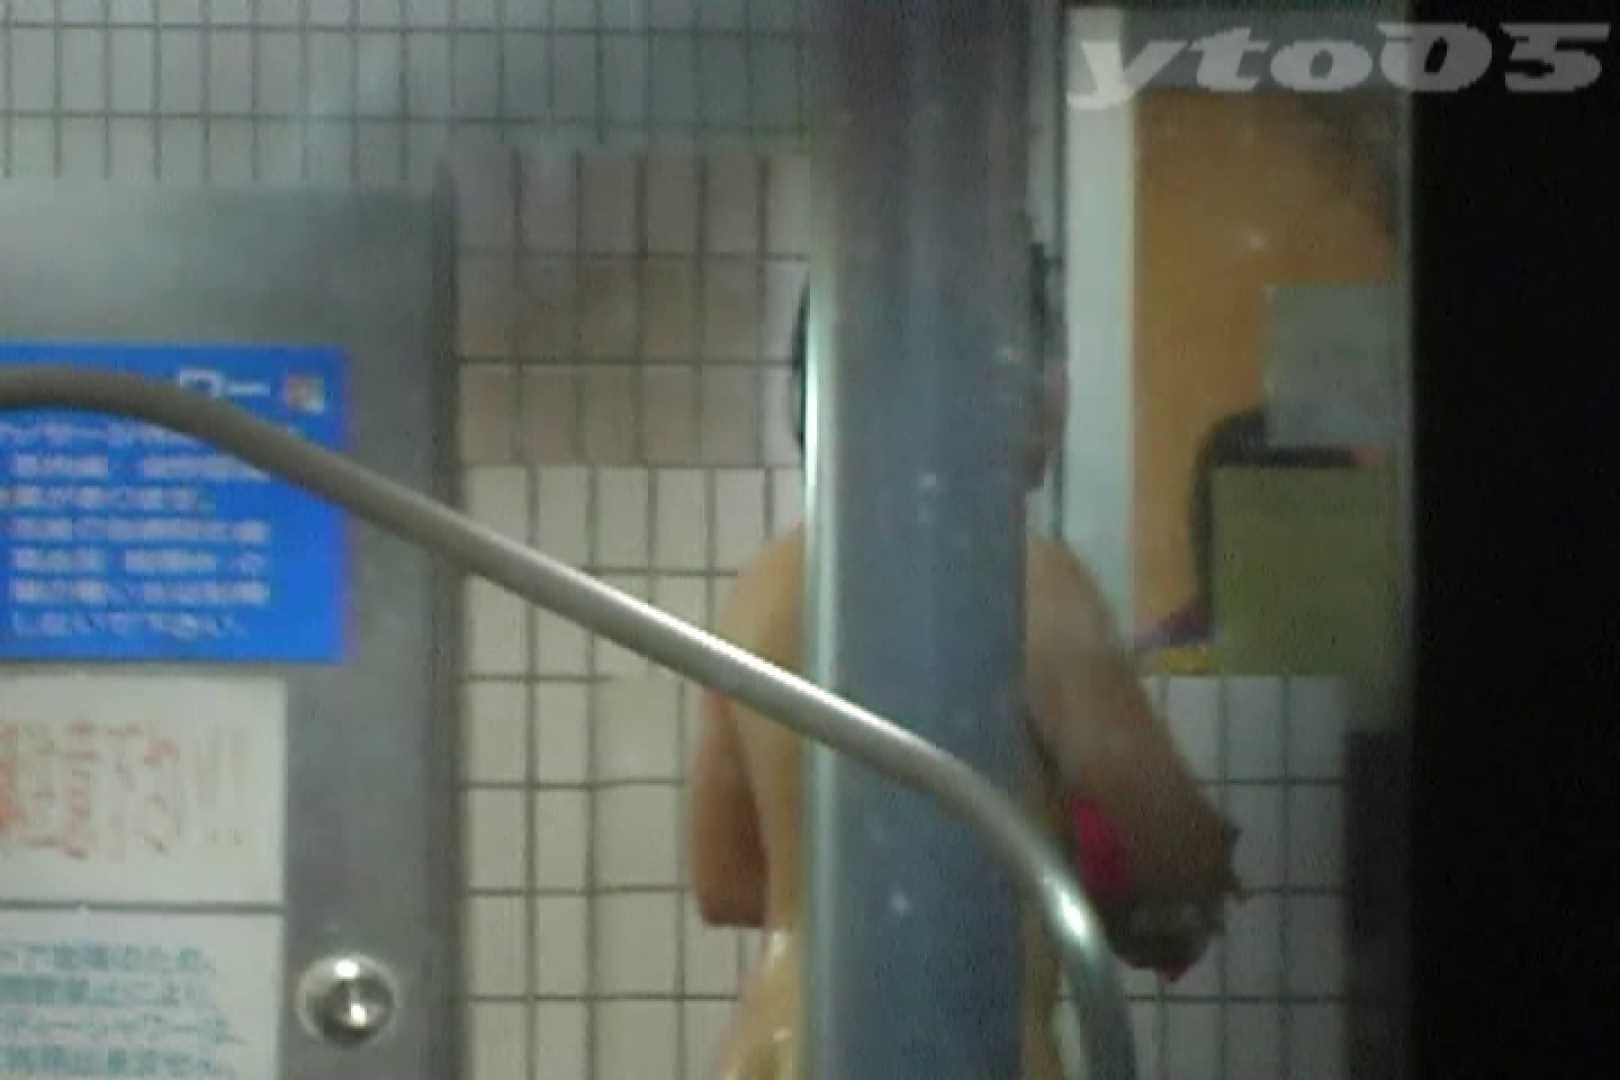 ▲復活限定▲合宿ホテル女風呂盗撮 Vol.31 合宿 エロ画像 84連発 55